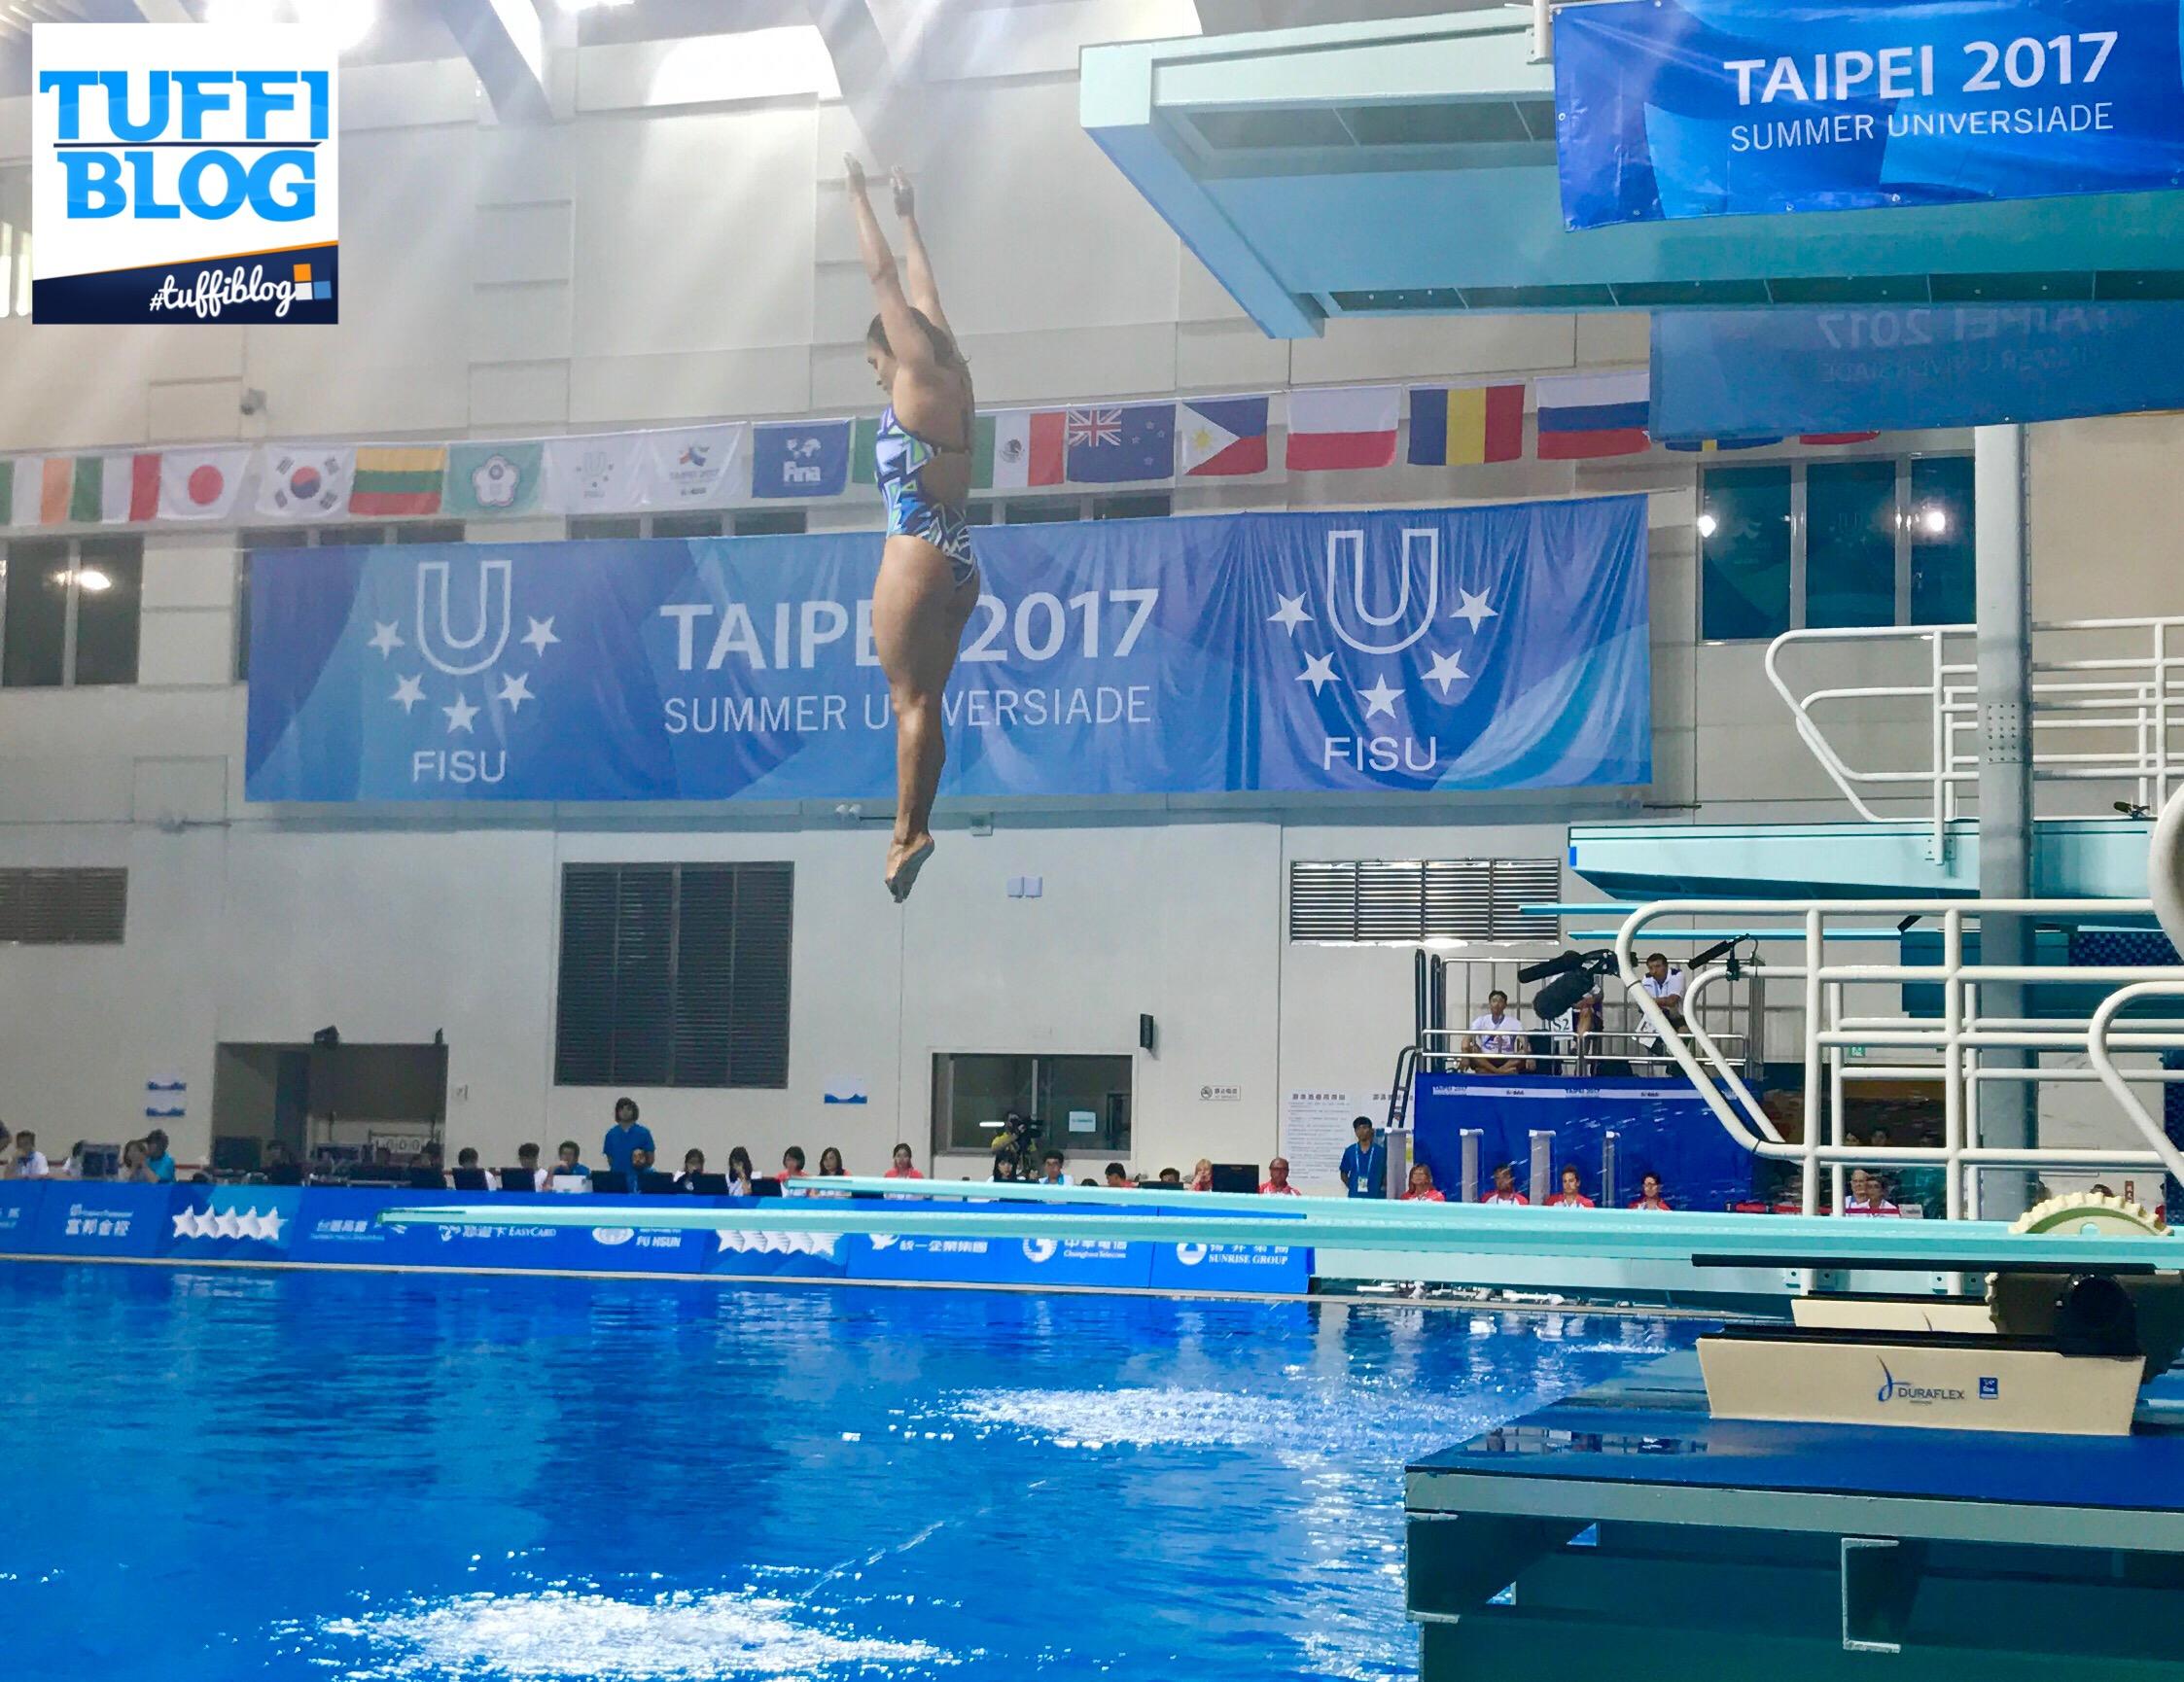 Universiadi 2017: Taipei - a Messico e Russia le prime vittorie!